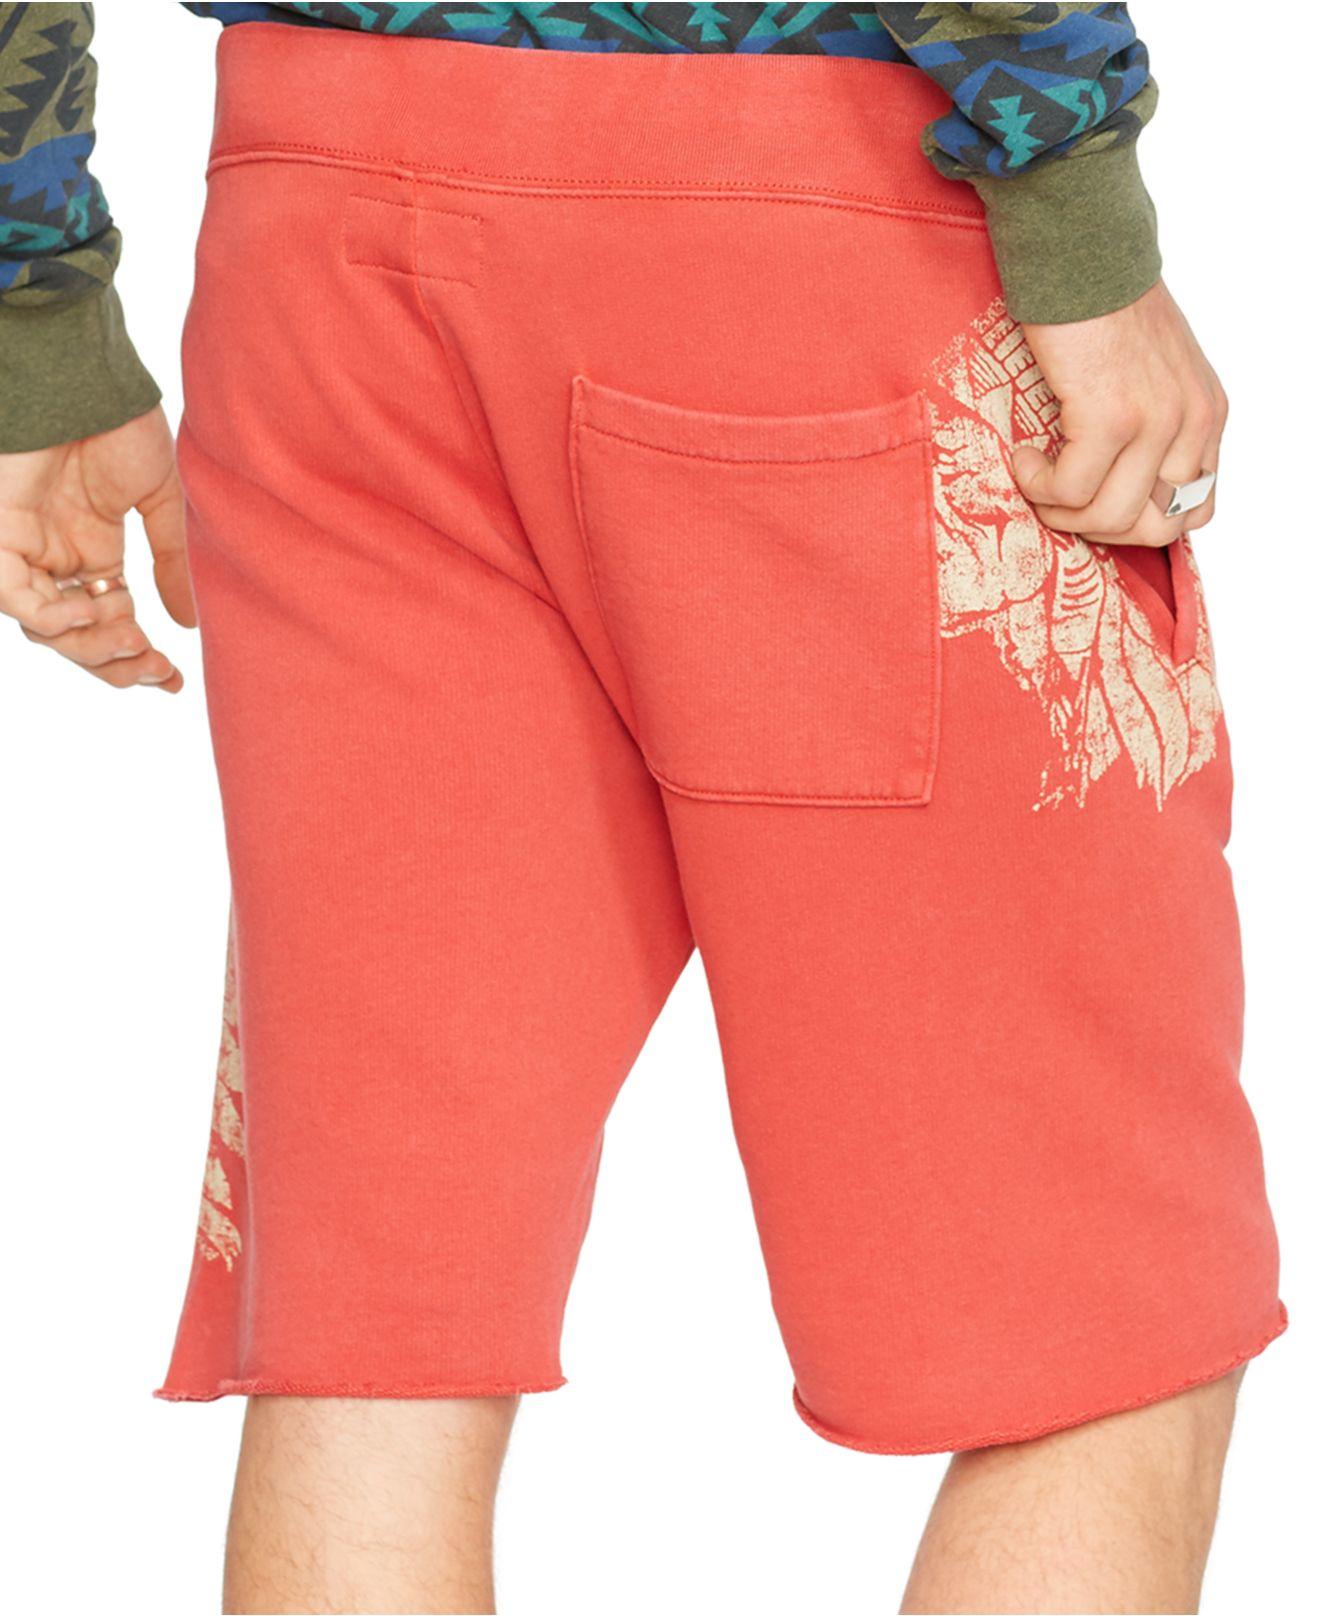 ralph lauren men\u0027s shorts sale big and tall